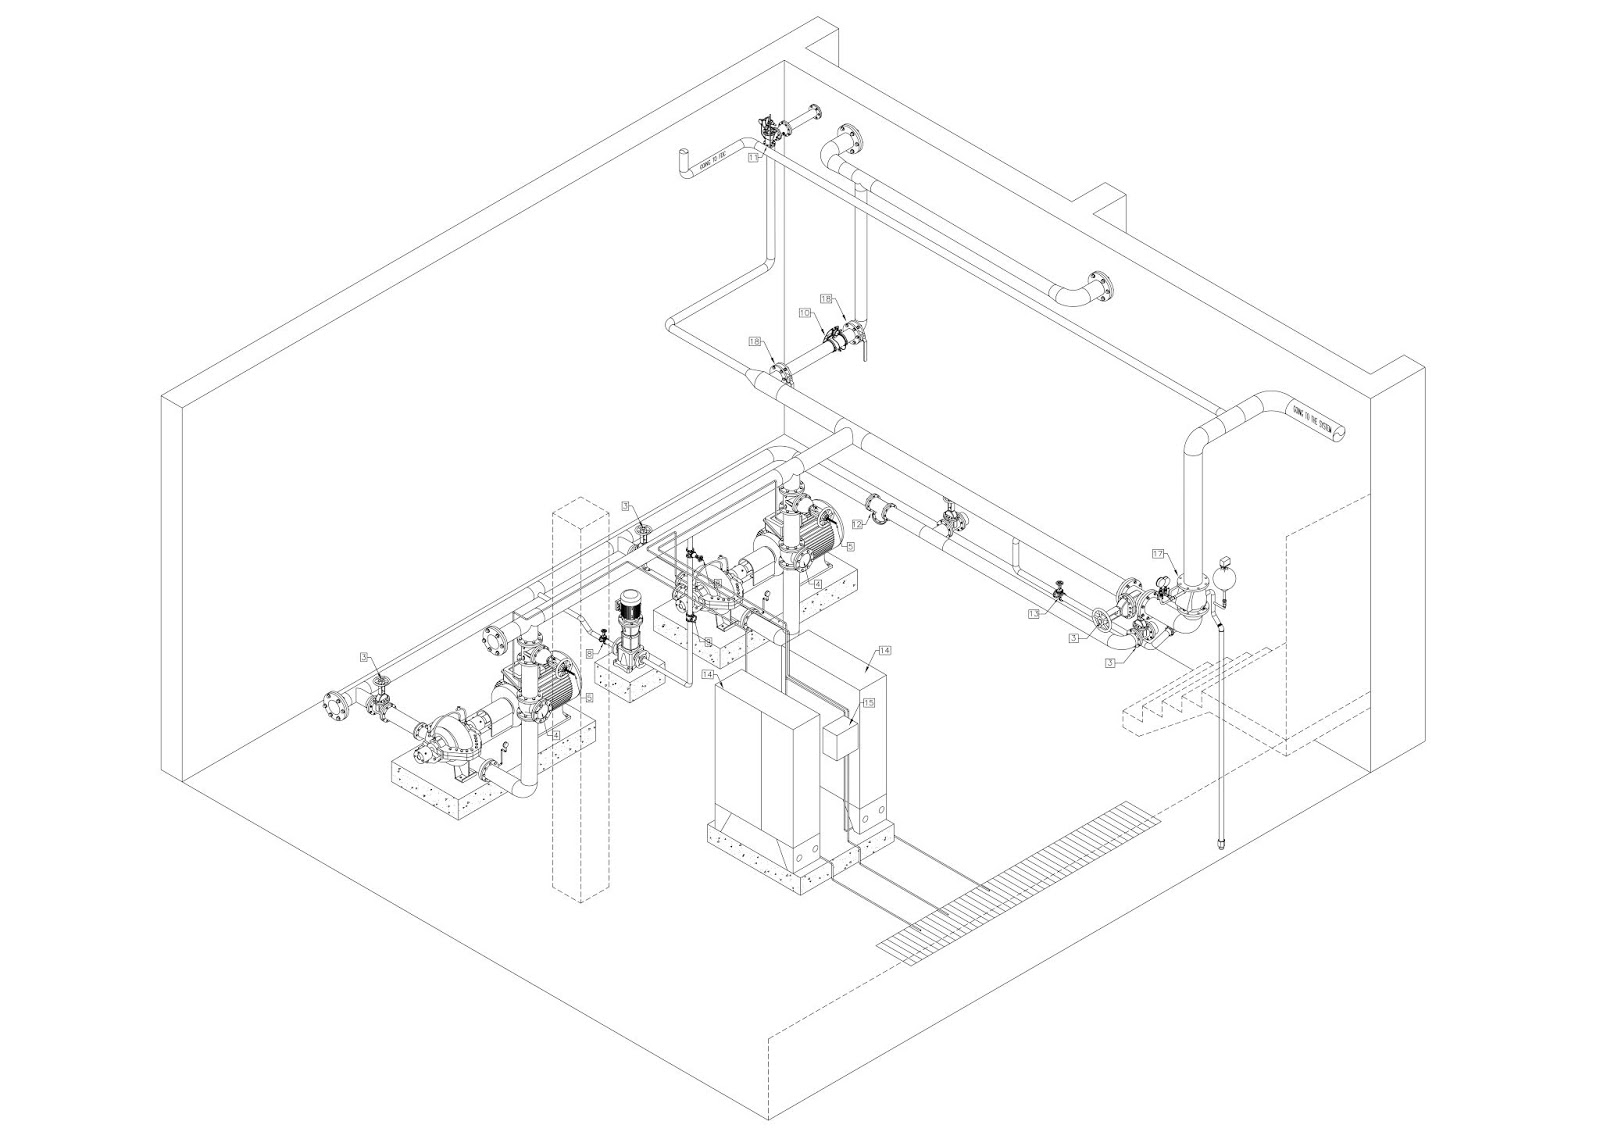 Fire Fighting Pump Room Drawings - CAD Needs